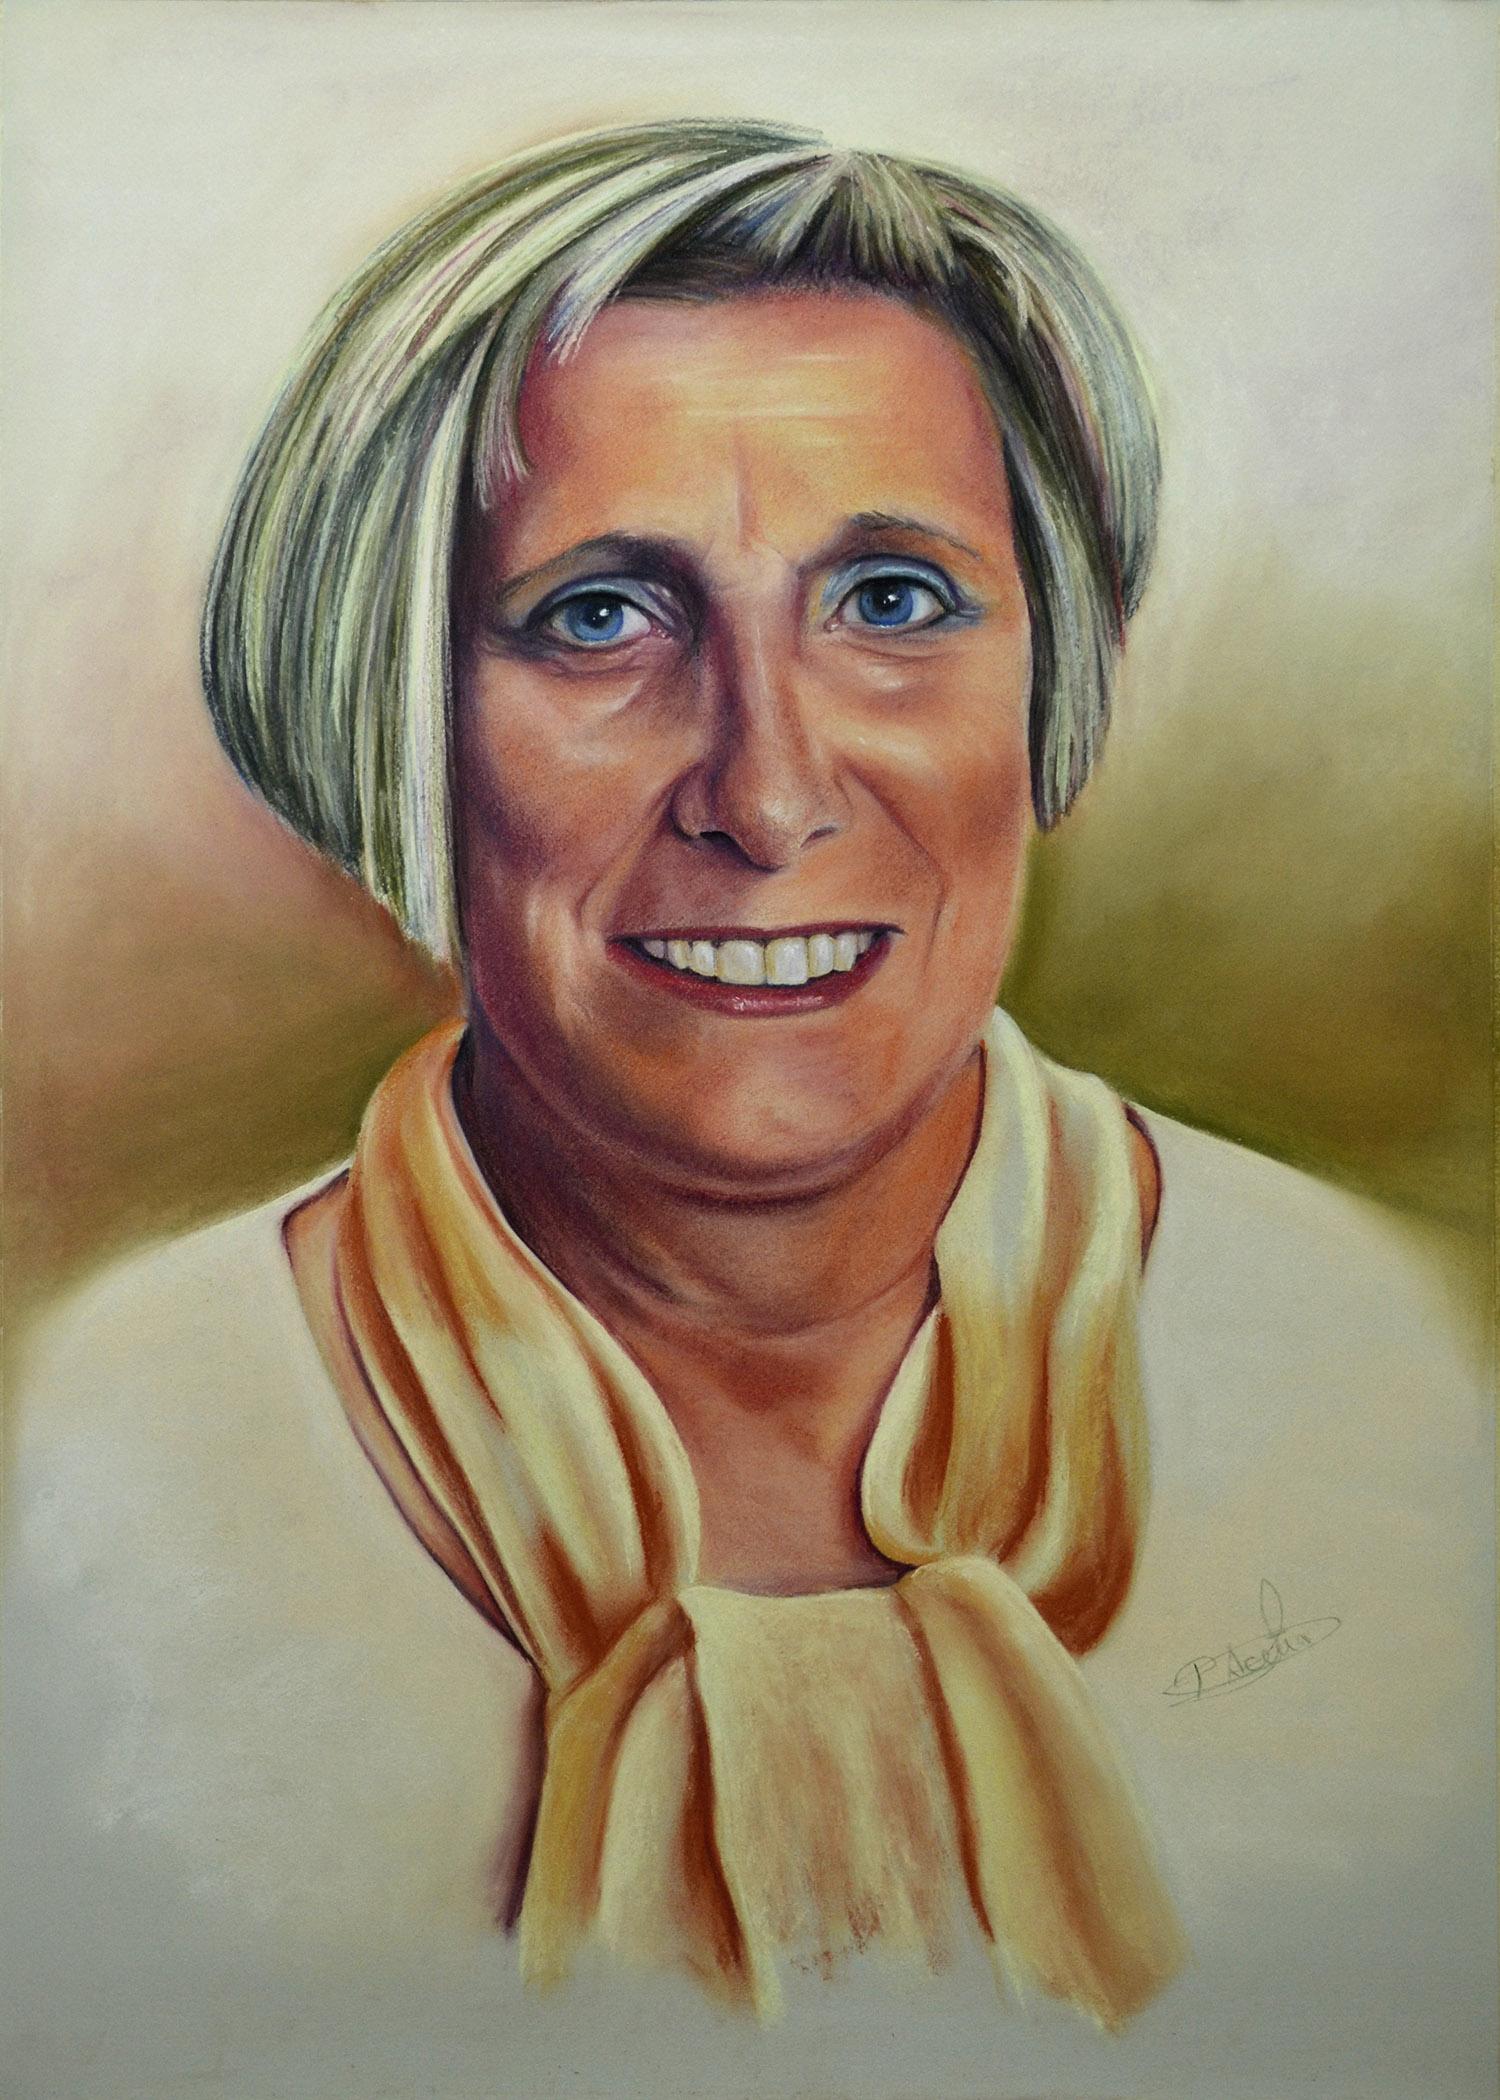 Maricarmen. Pilar Aceña, retrato al pastel, 70 x 50 cm. 2016